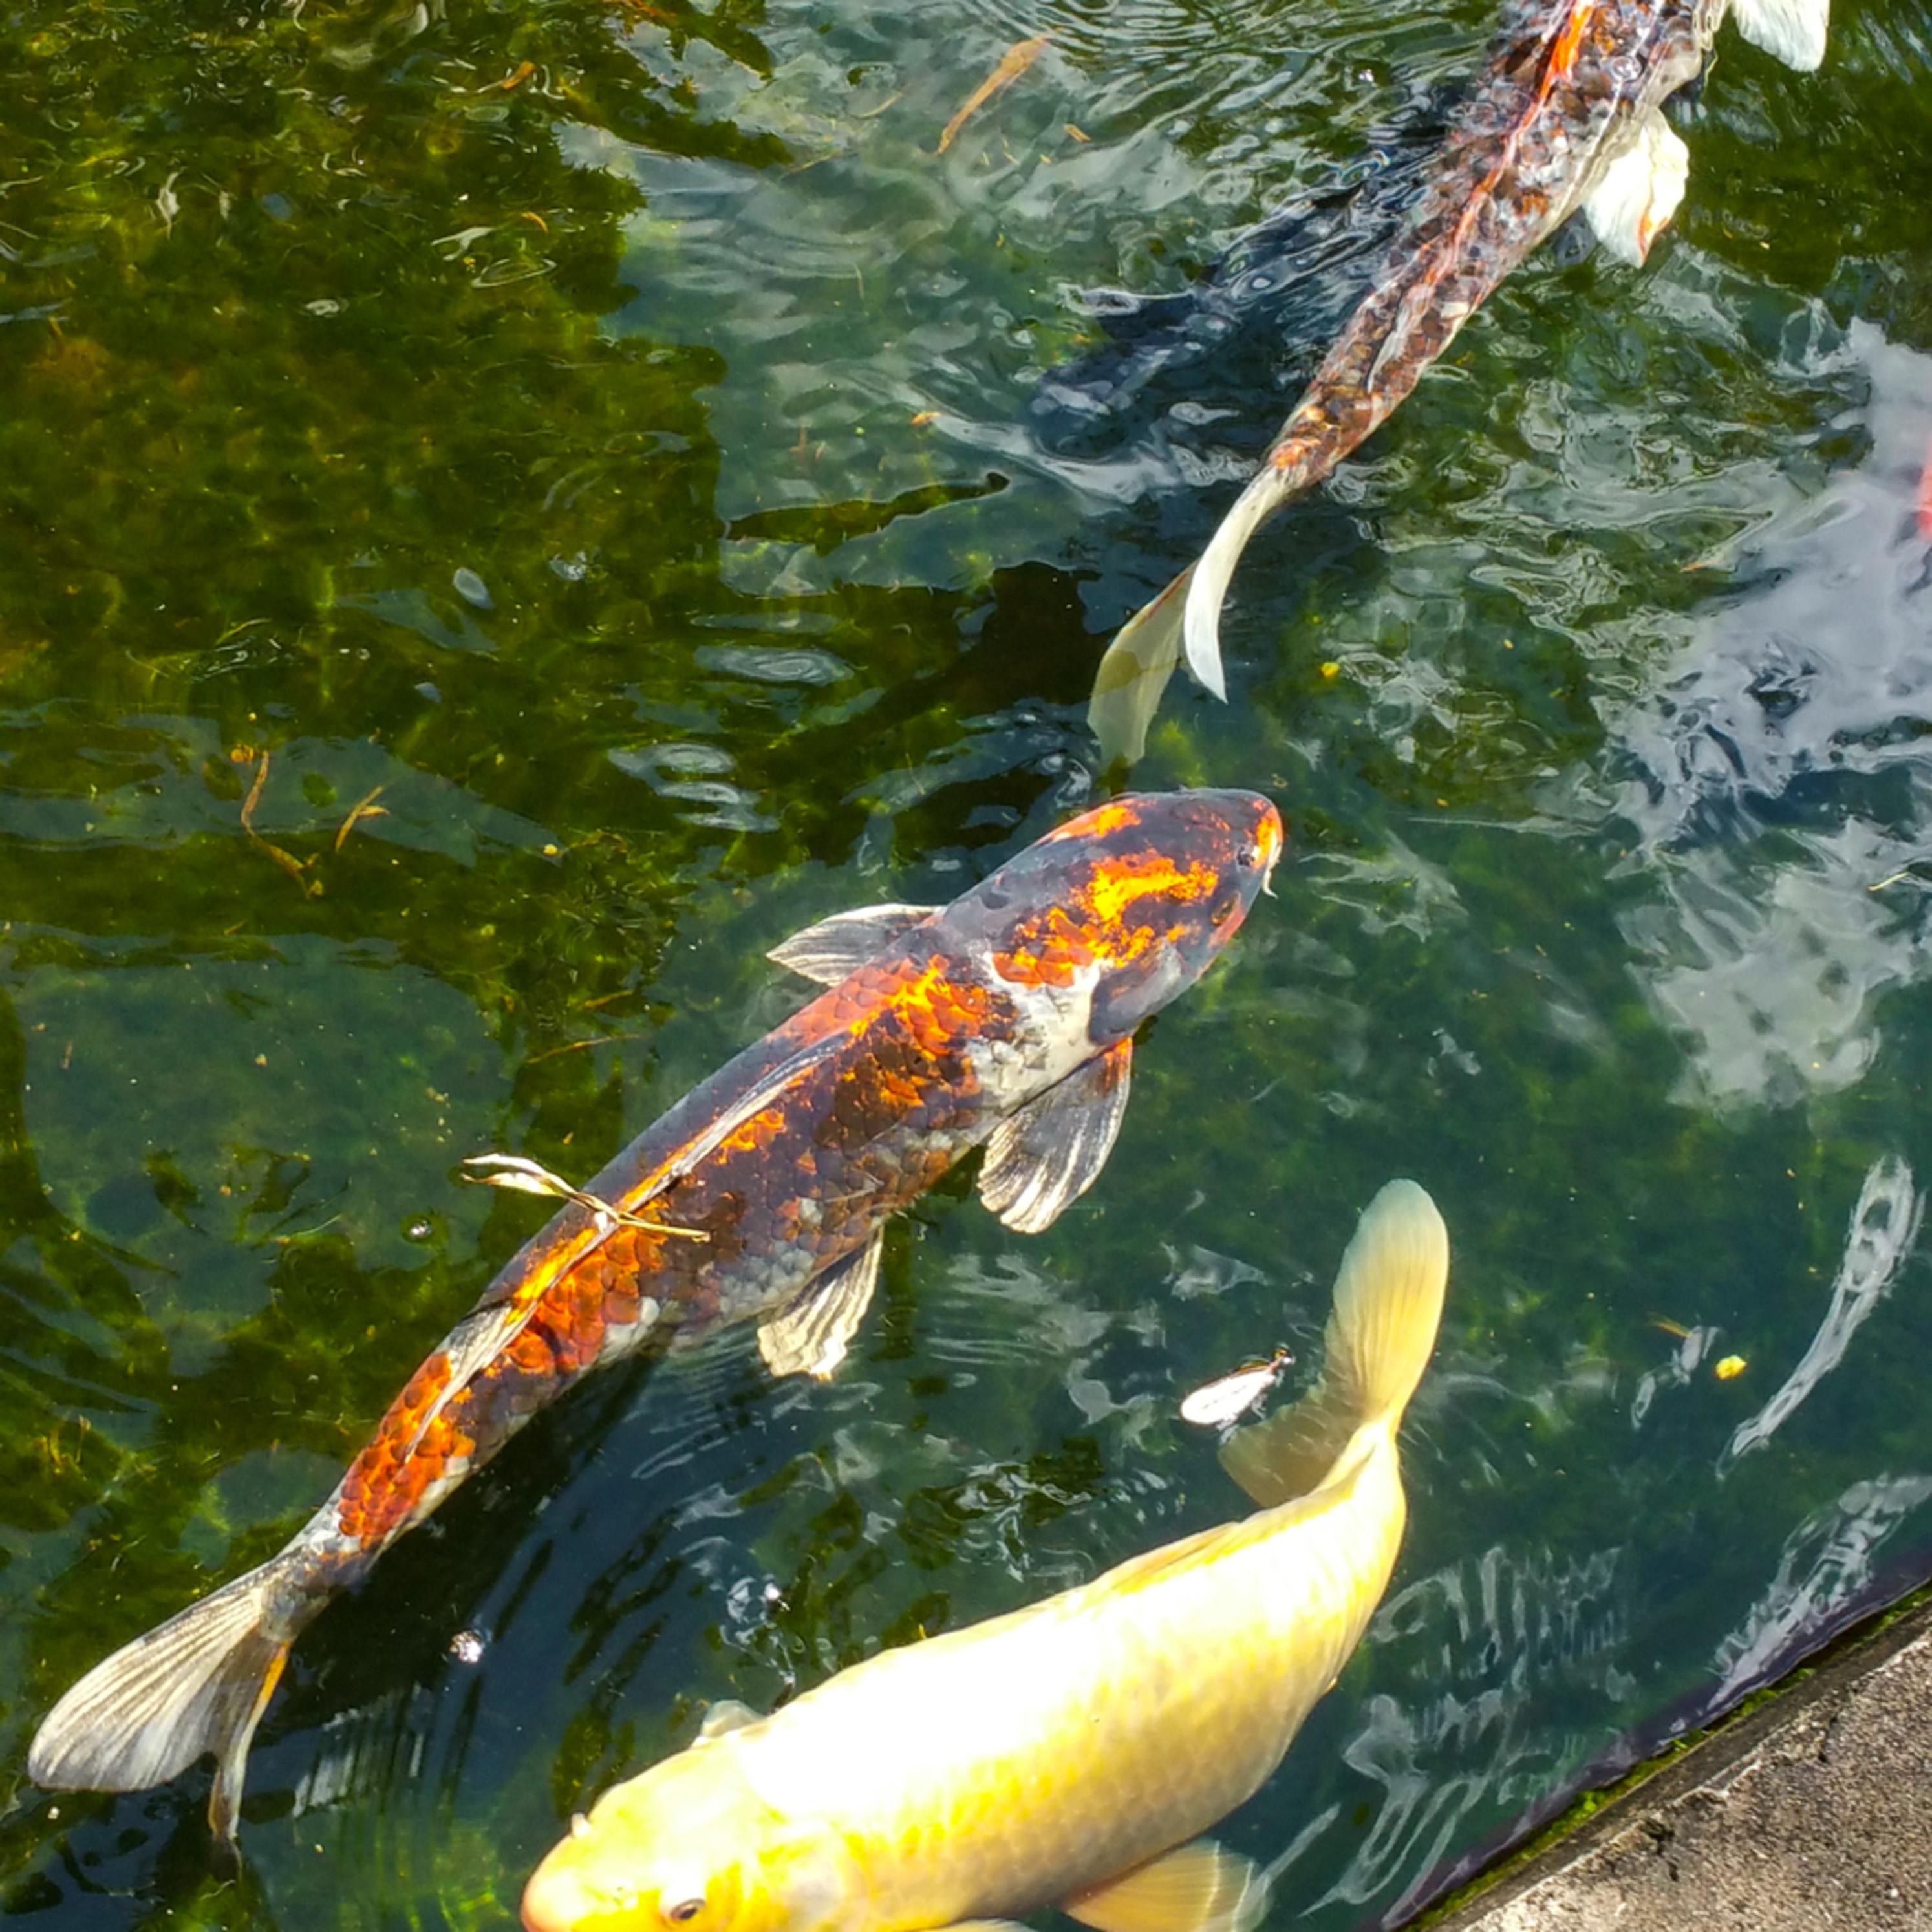 Koi swimming in pond htdq6t